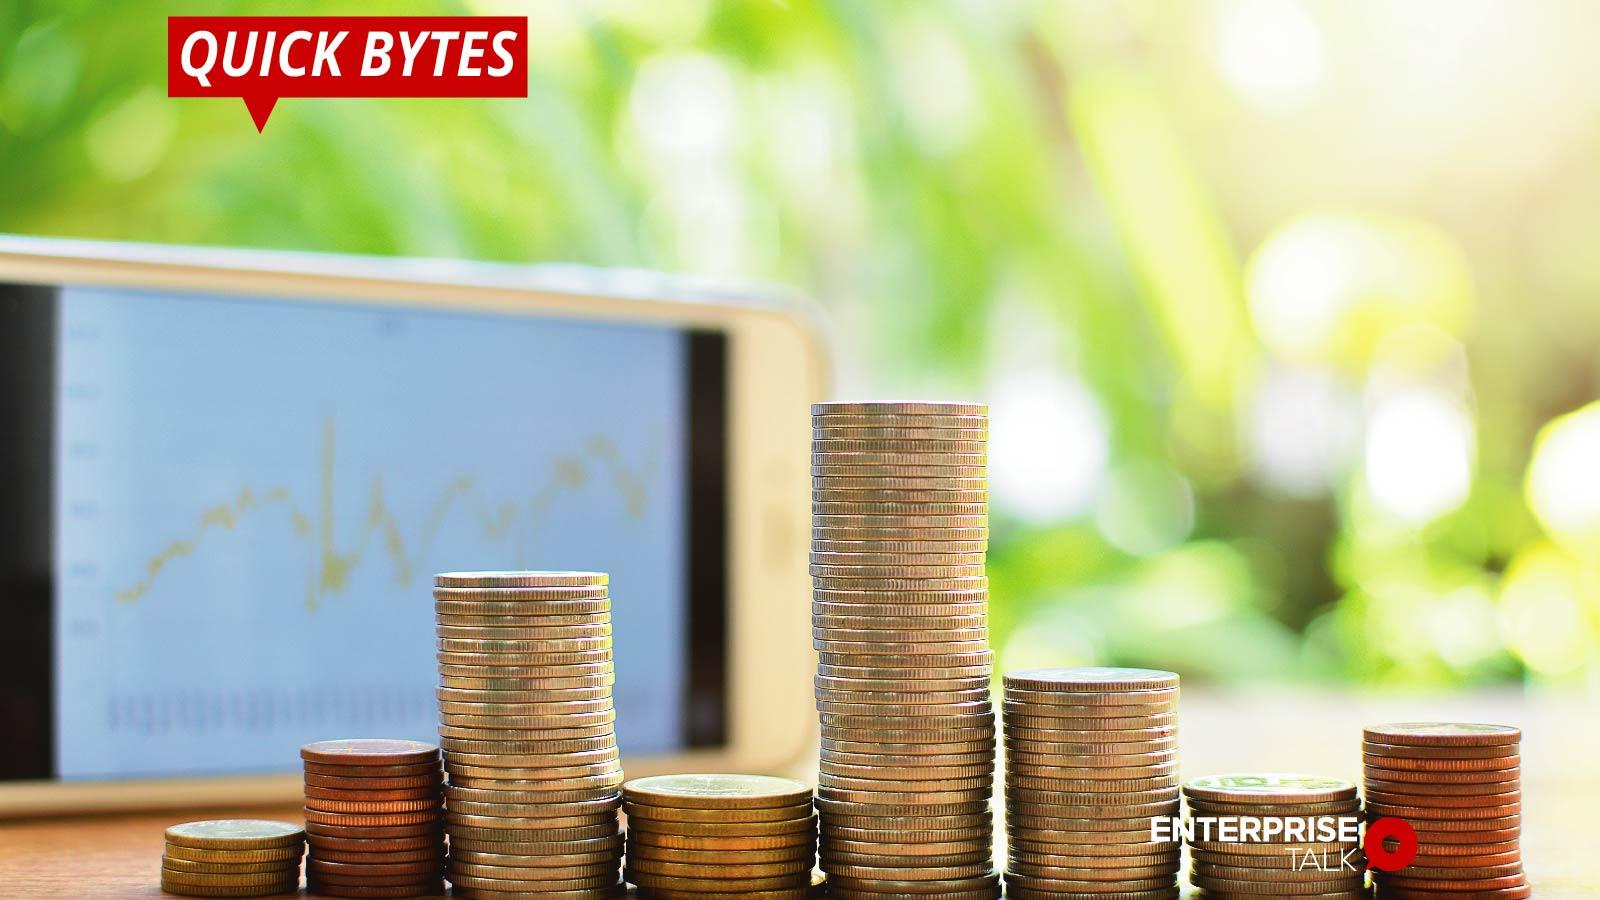 Fivetran Secures _100 Million in Series C Funding